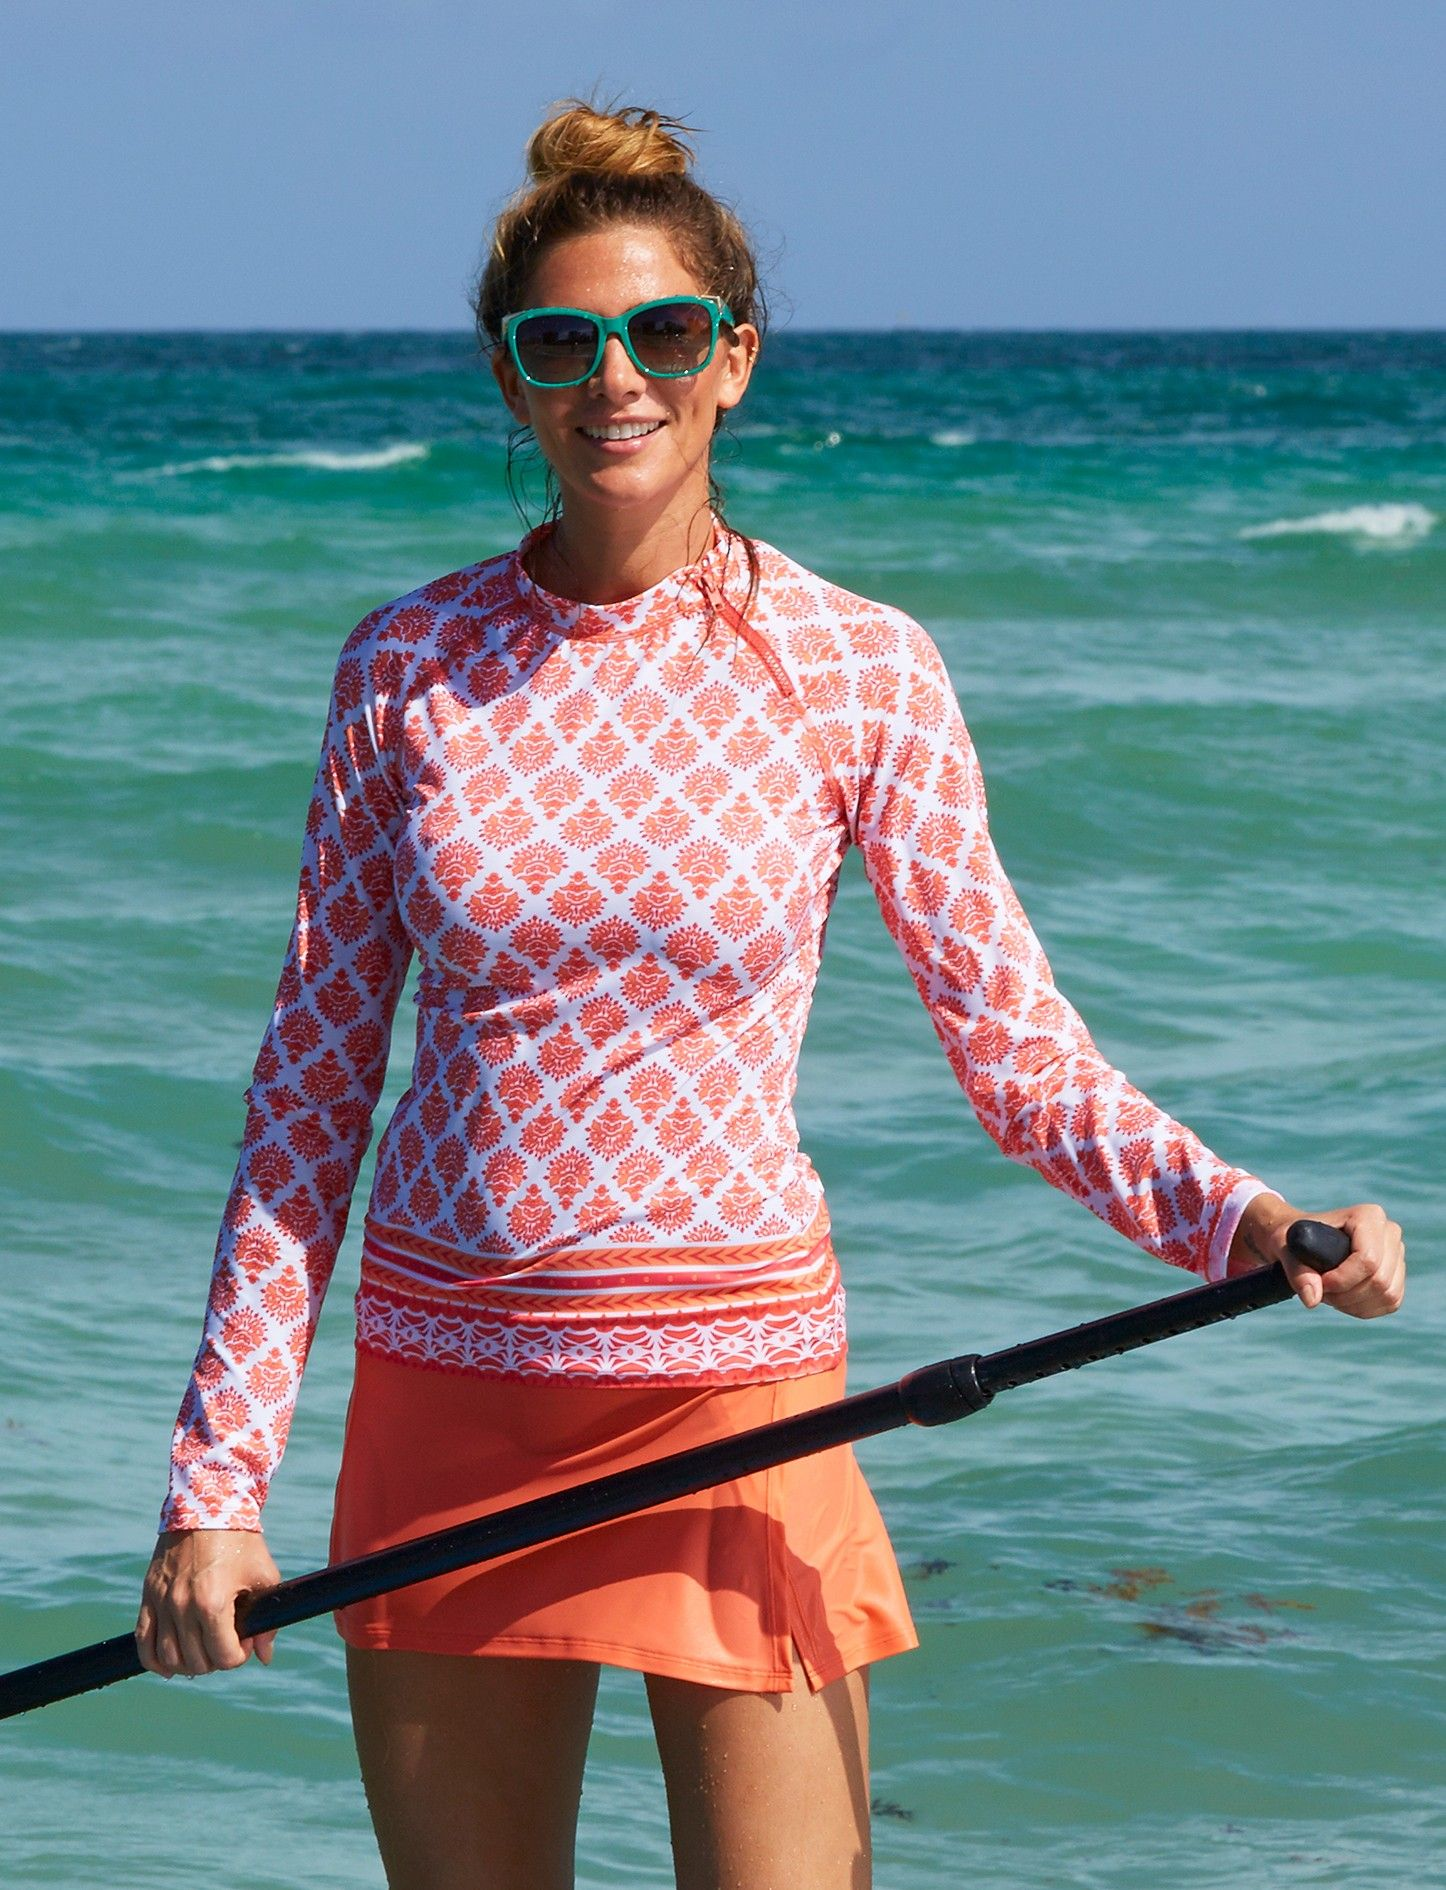 08745aaf77 Nantucket sound zipper rashguard, Cabana Life, UV 50+ Sun protection